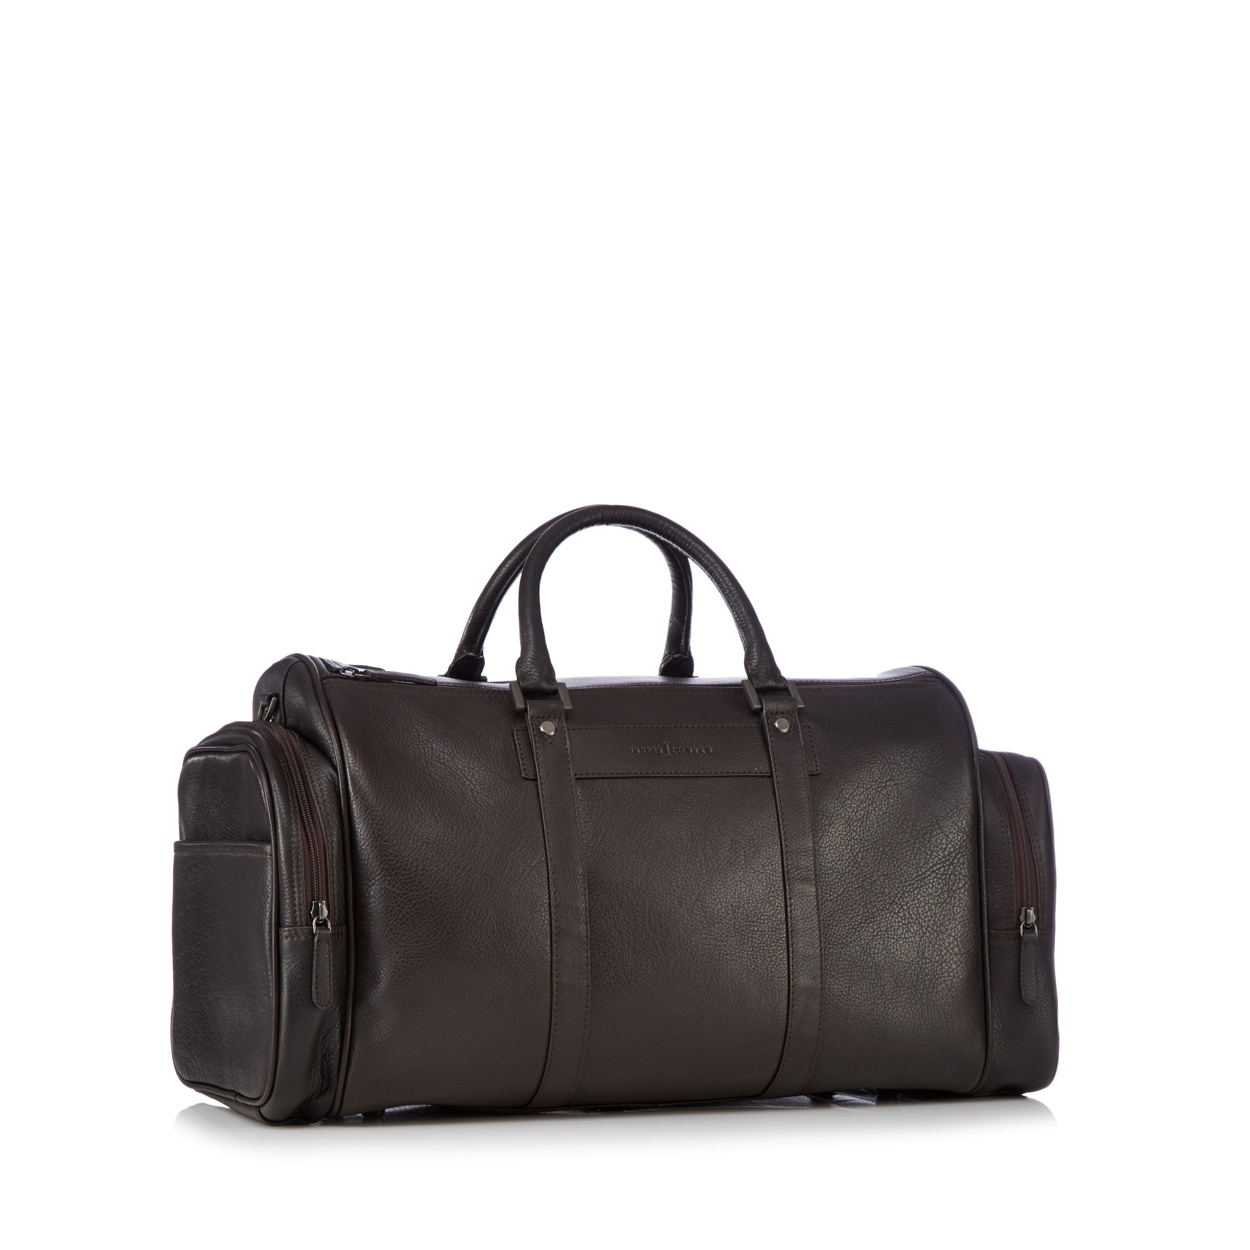 buy replica prada handbags - Bags - Men | Debenhams